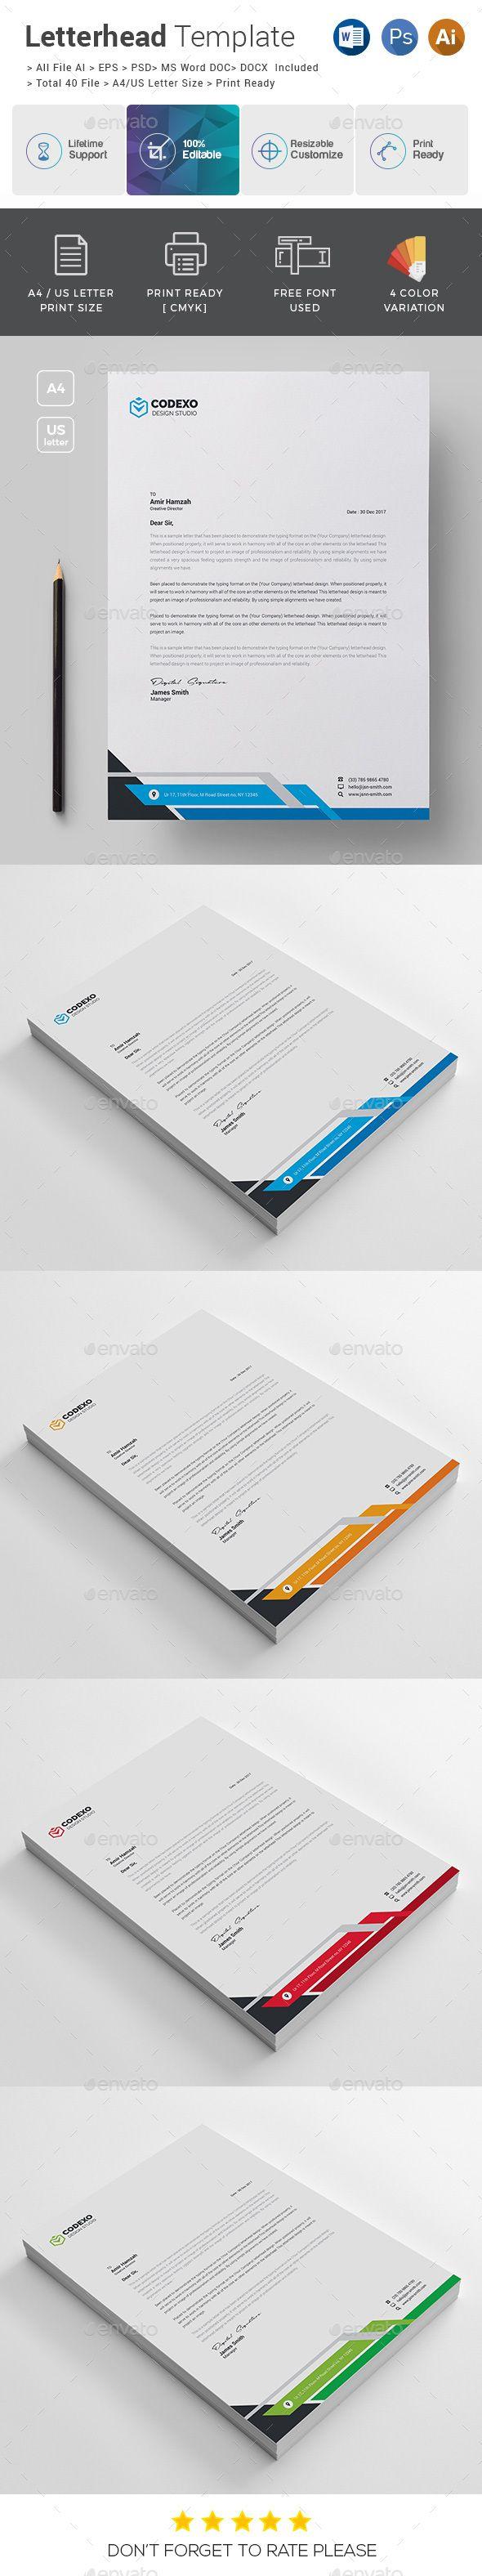 Letterhead Template 833 best Letterhead Design Templates